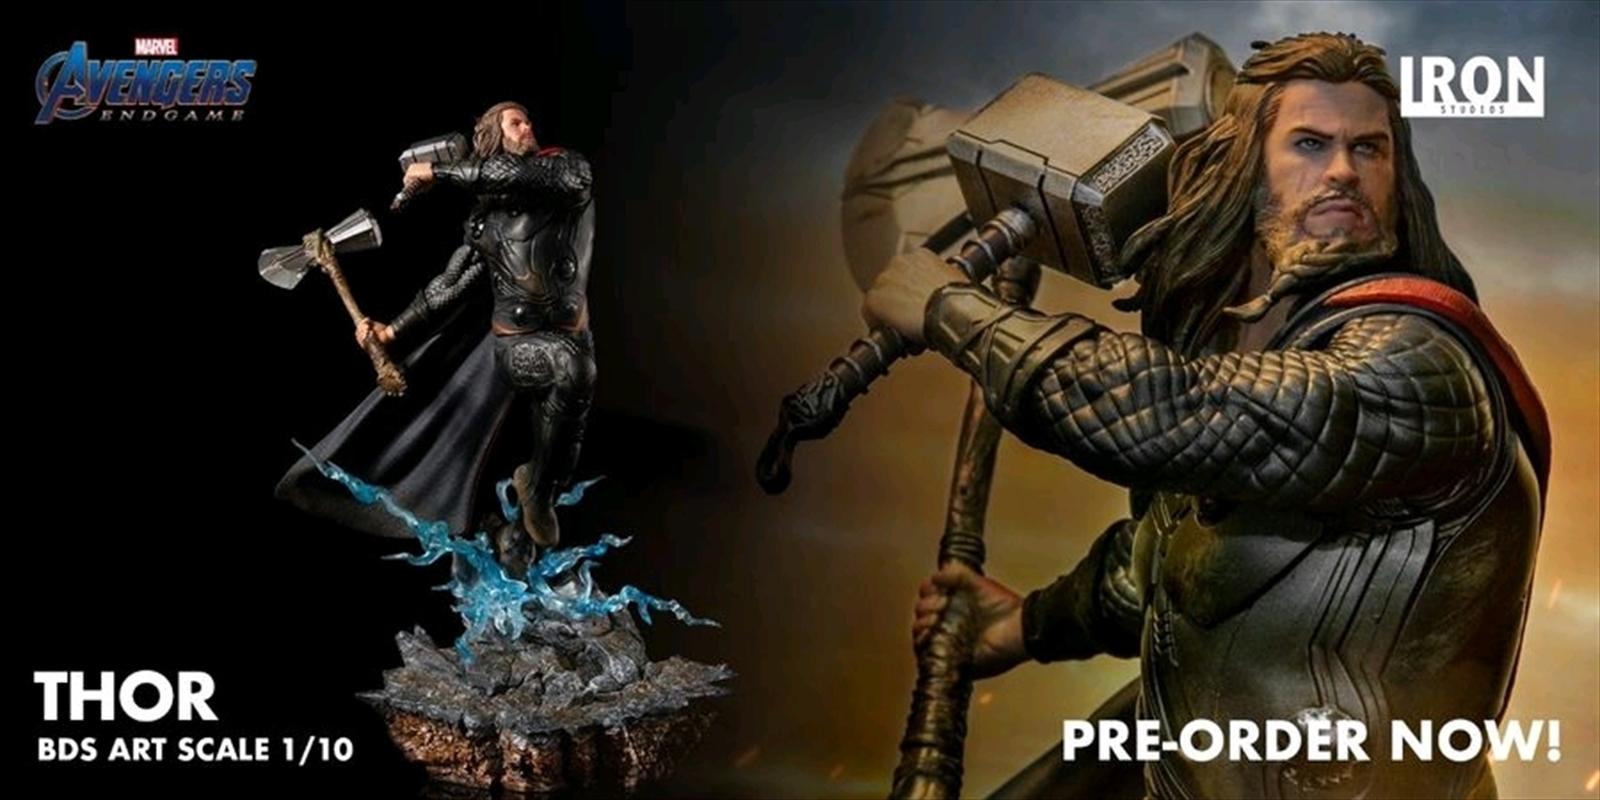 Avengers 4: Endgame - Thor 1:10 Scale Statue   Merchandise